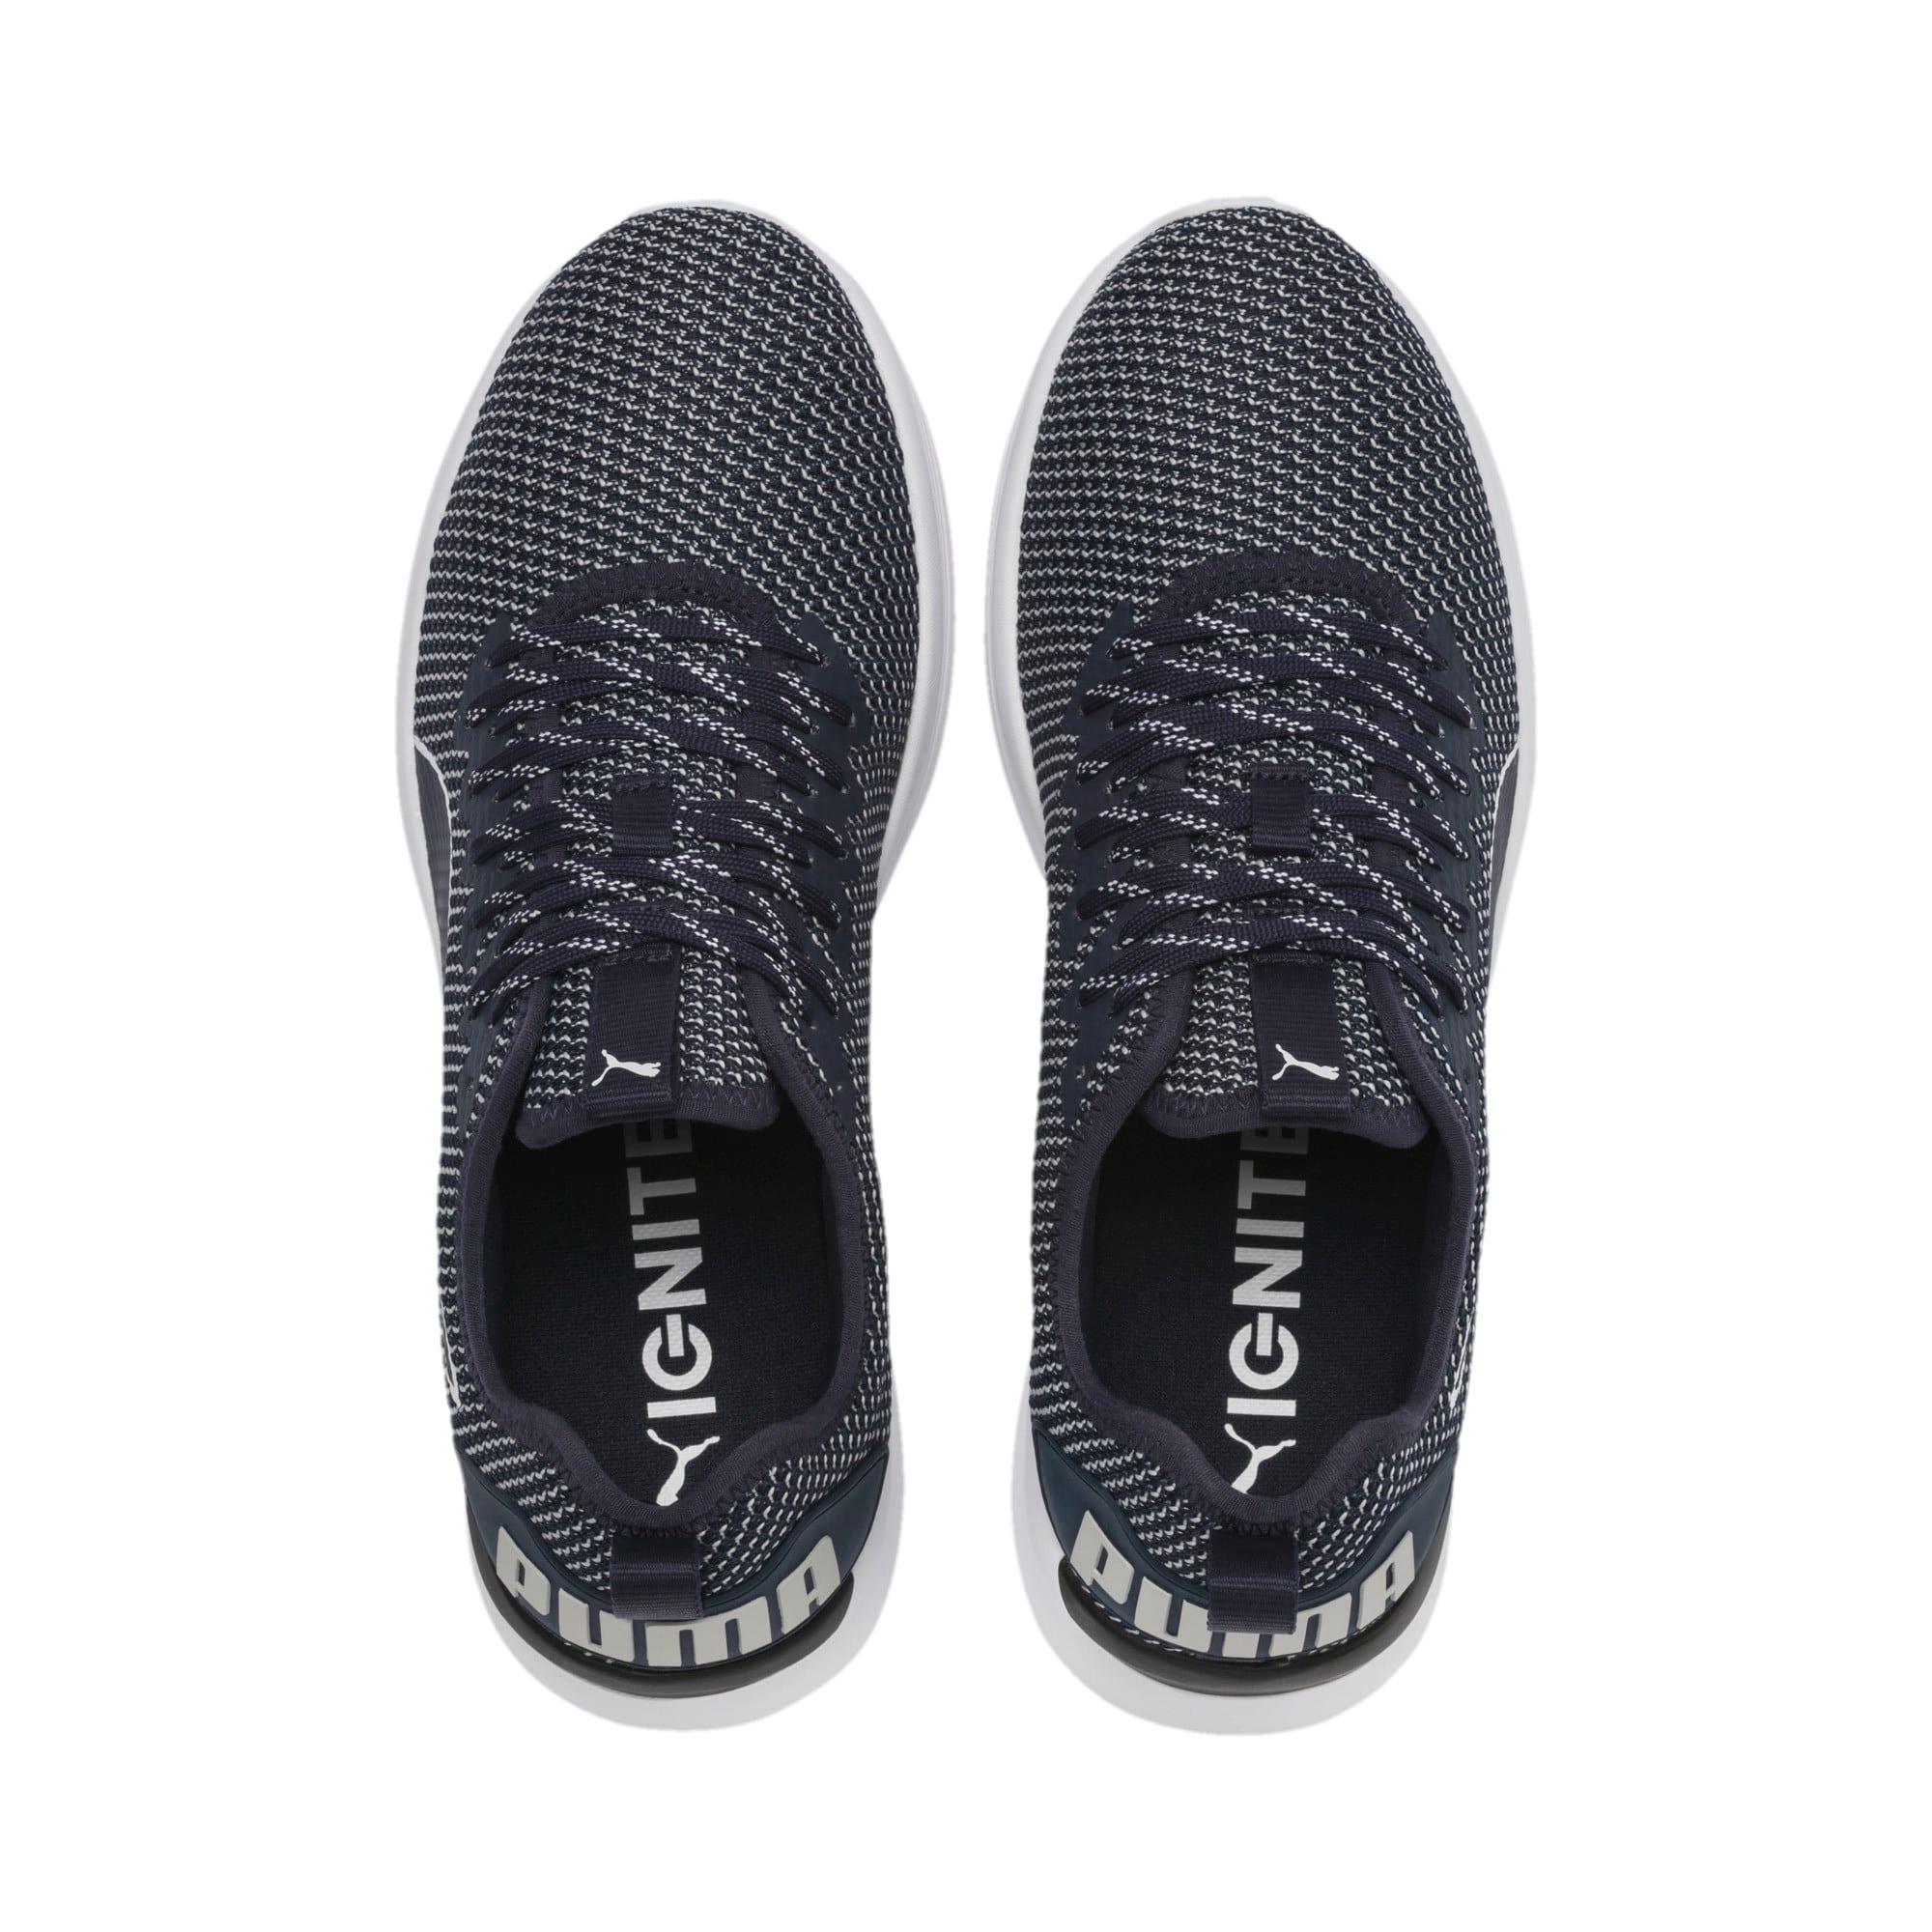 Thumbnail 7 of IGNITE Flash Men's Training Shoes, Peacoat-Glacier Gray-White, medium